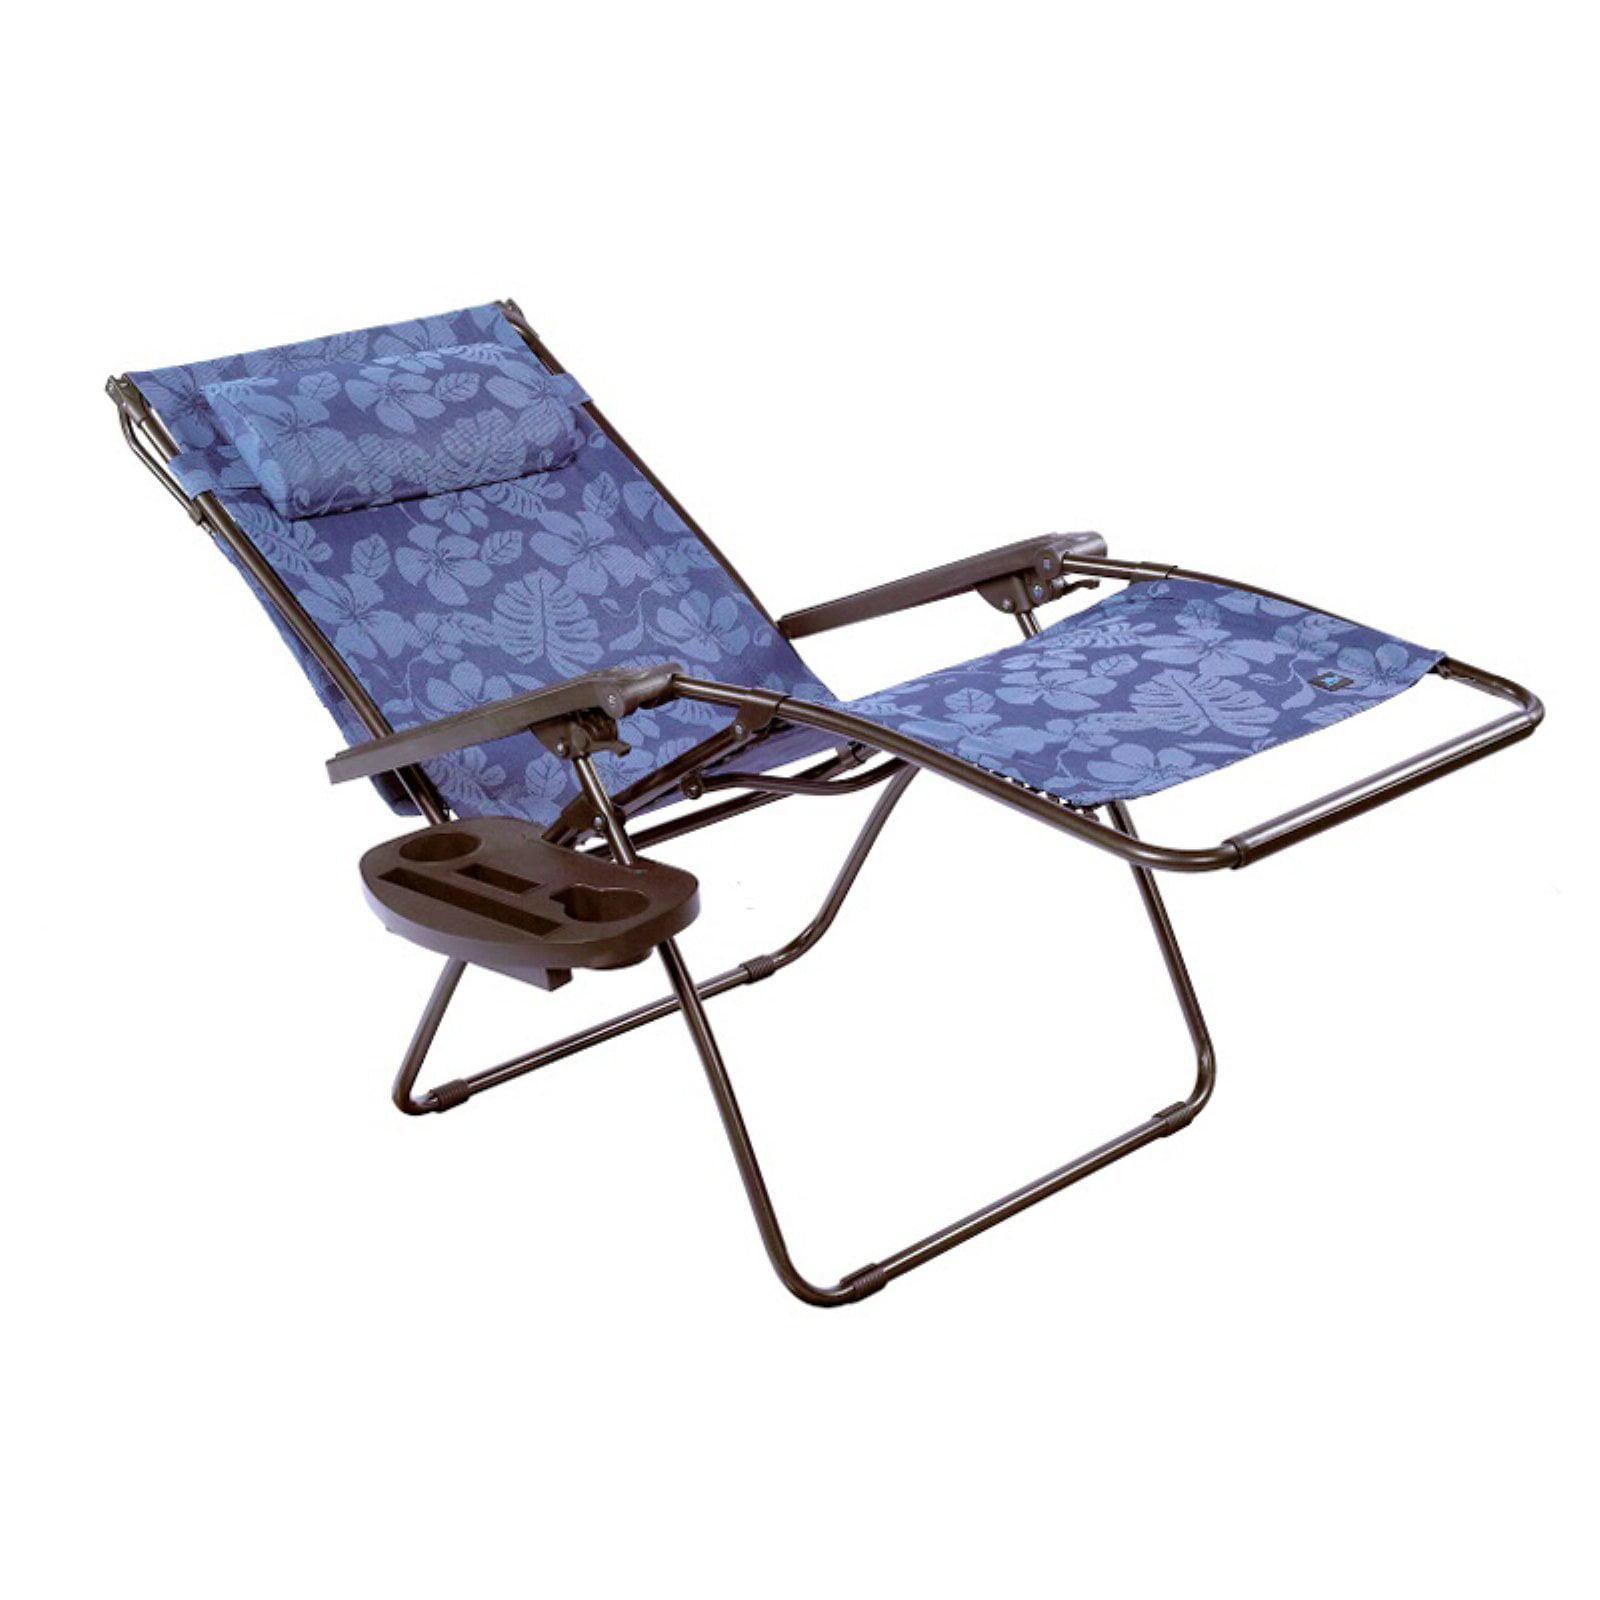 zero xl bliss hammock rocker recliner gravity free chair deluxe lounge patio and hammocks